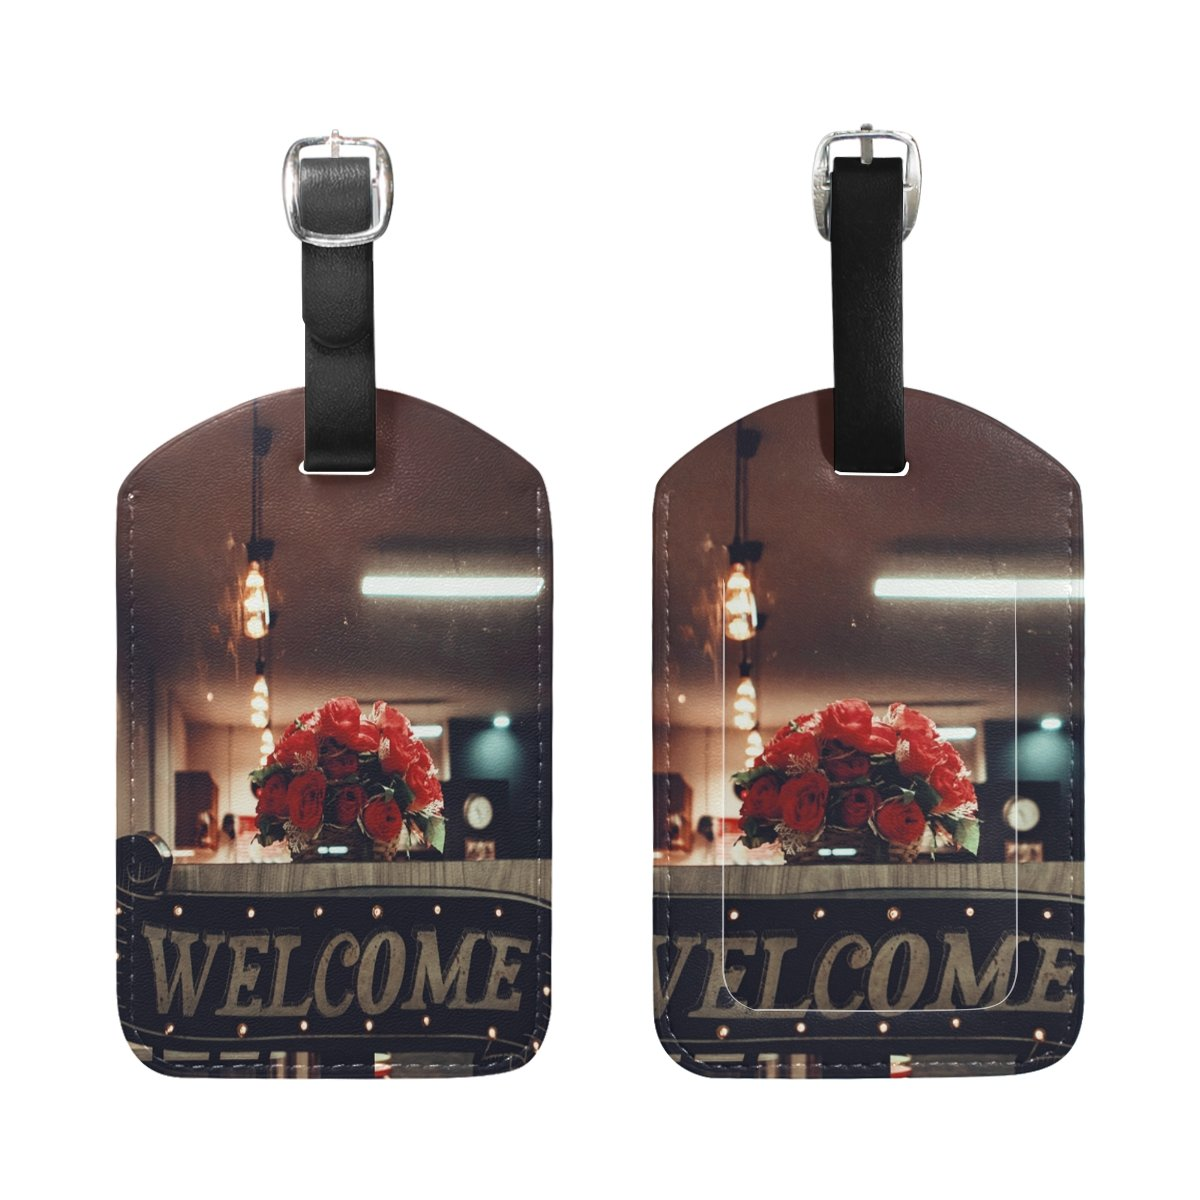 Saobao Travel Luggage Tag Dinner Flowers Lighting PU Leather Baggage Suitcase Travel ID Bag Tag 1Pcs